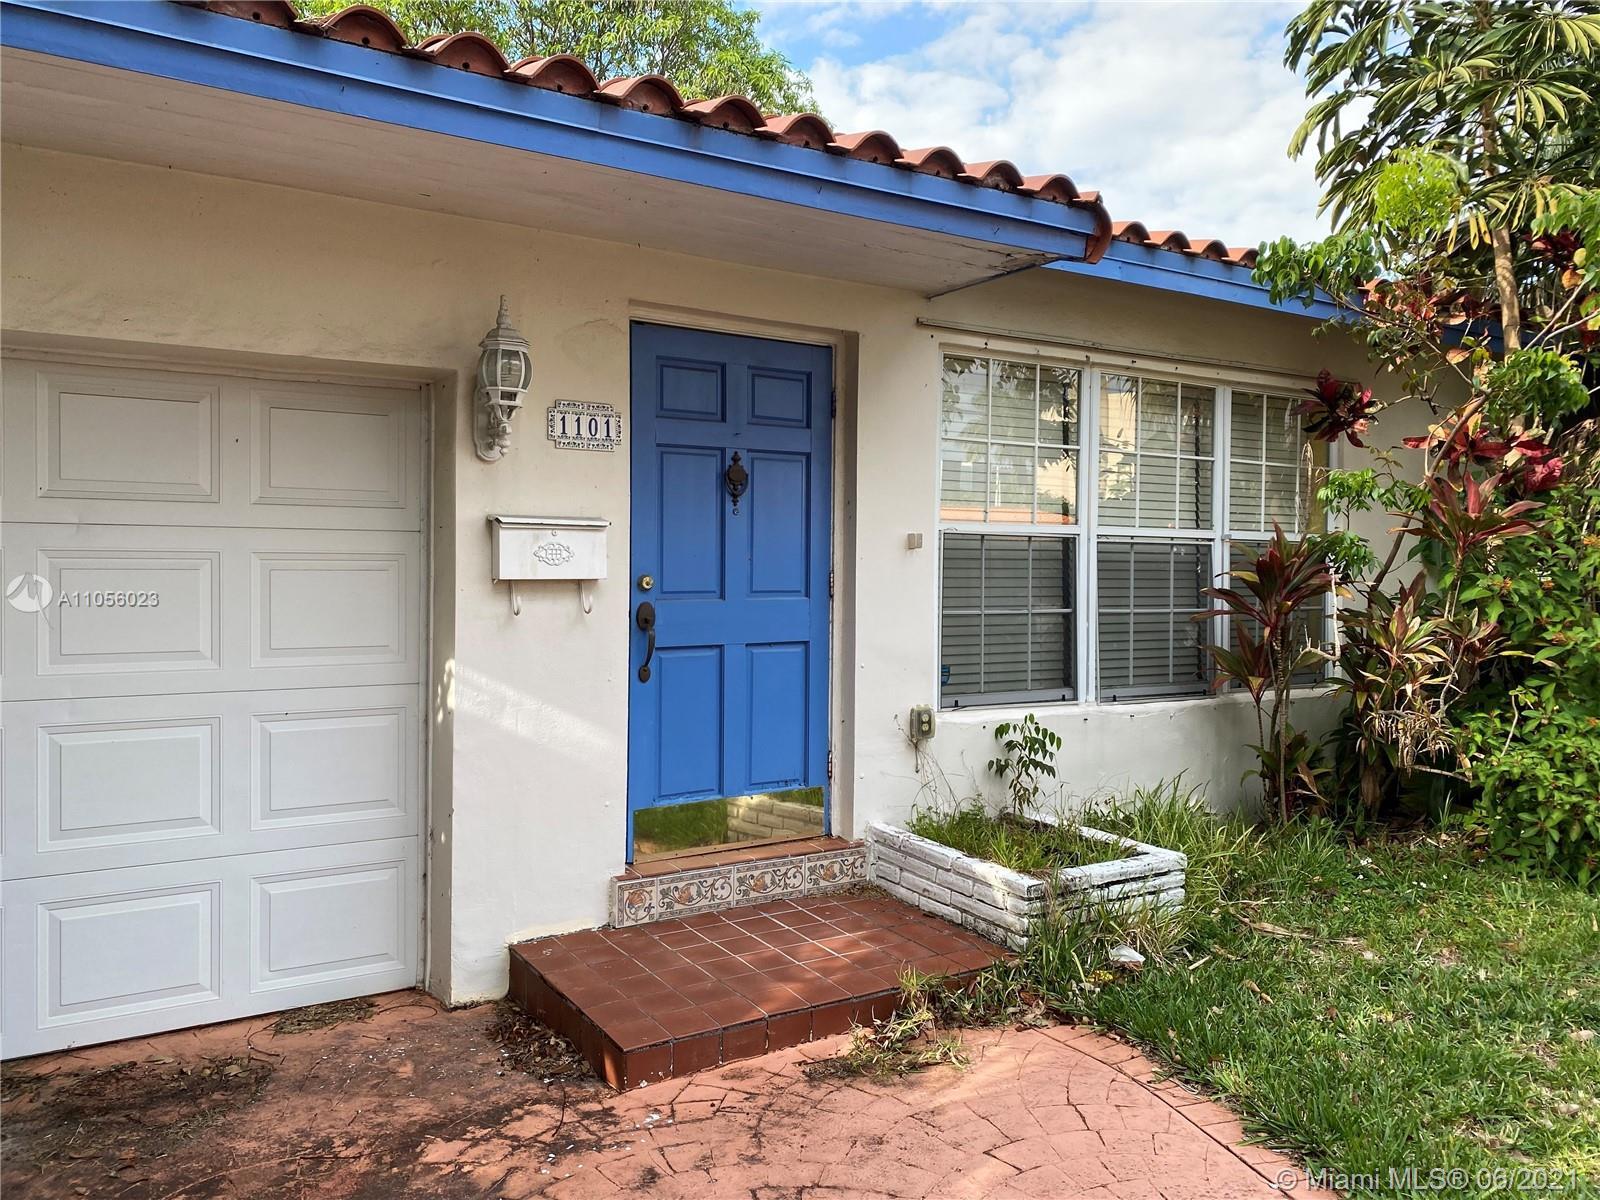 Gulfstream Estates - 1101 NE 5th St, Hallandale Beach, FL 33009